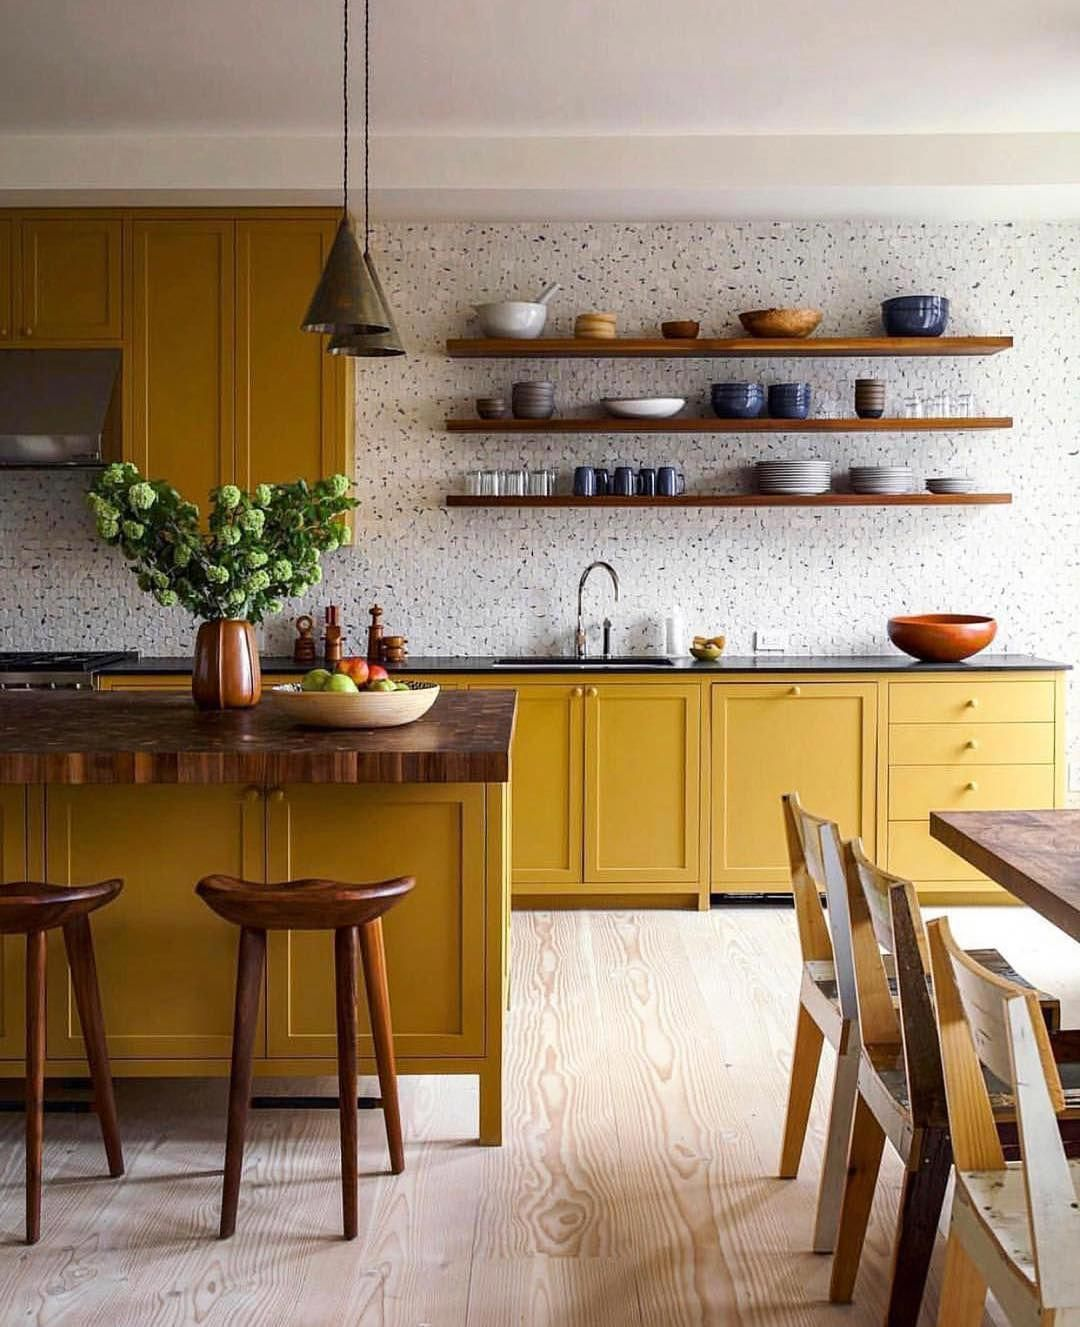 Beautiful Modern Dining Room Design Ideas Cocinasclasicas Kitchen Design Yellow Kitchen Cabinets Home Decor Kitchen